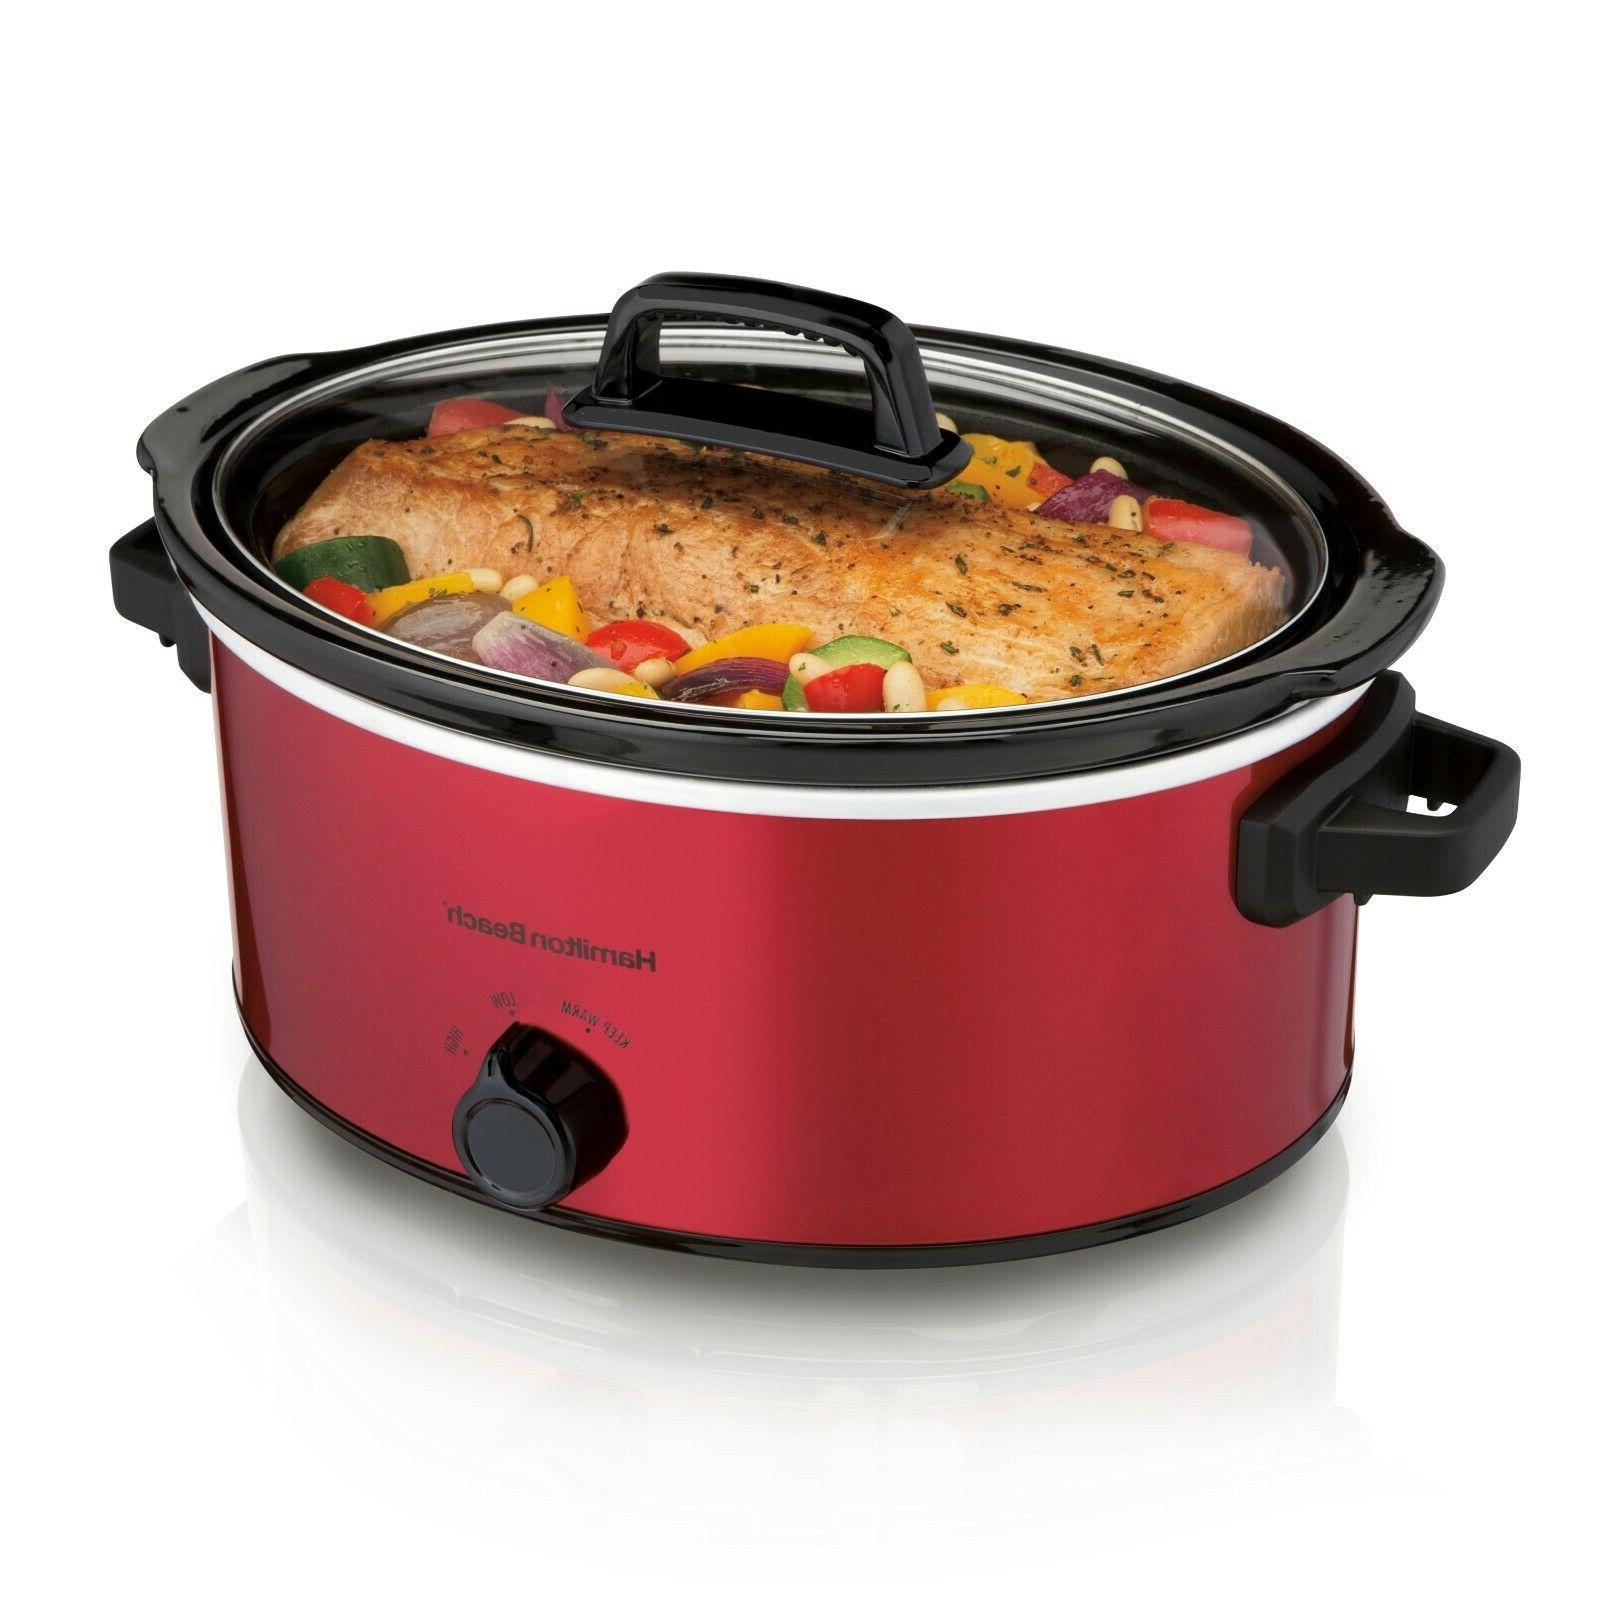 Removable Slow   Red Crock Pot